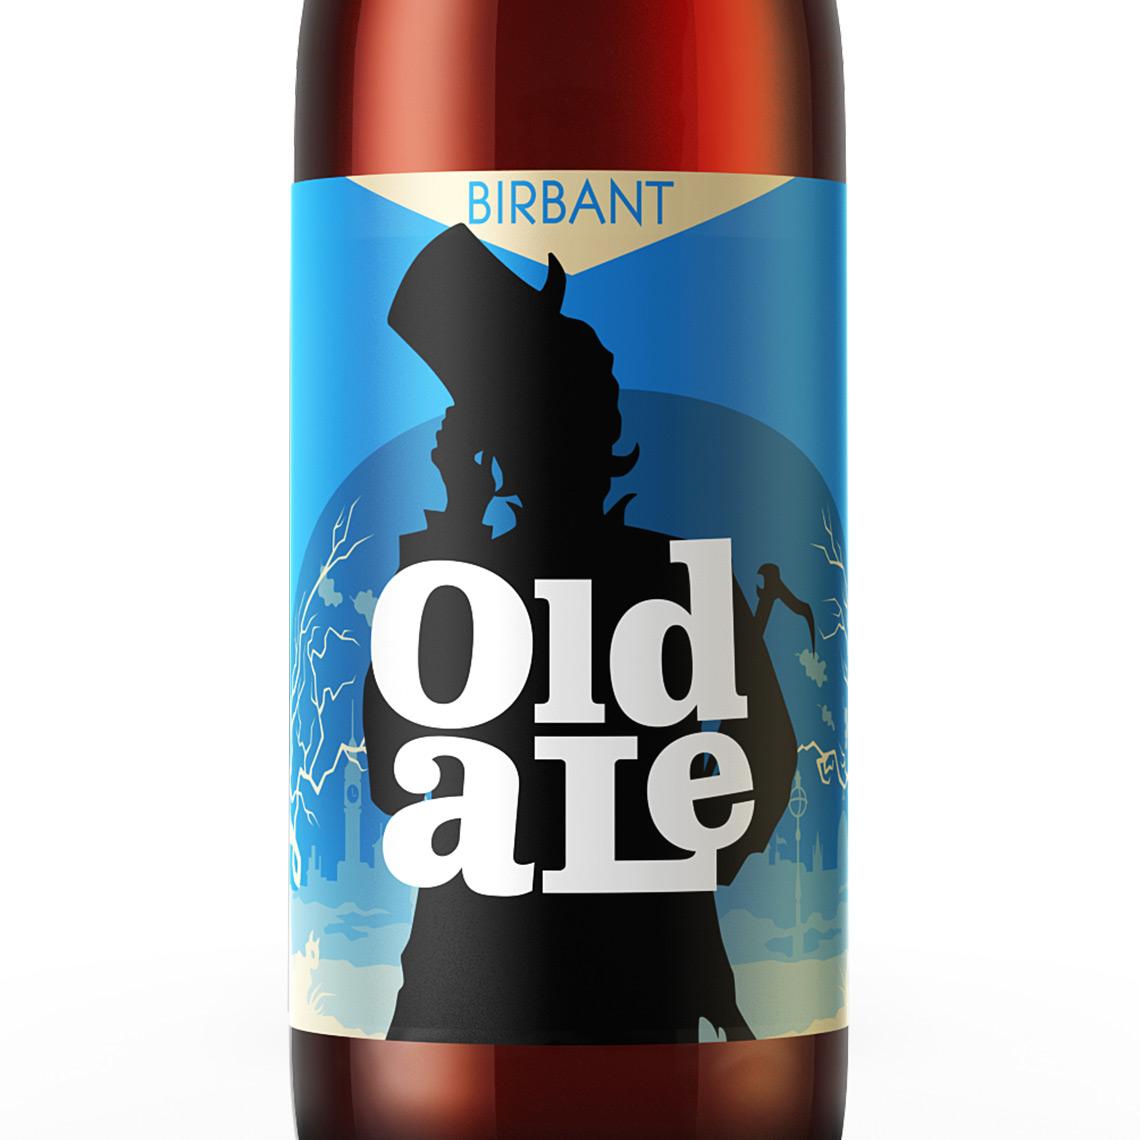 BIRBANT Old Ale